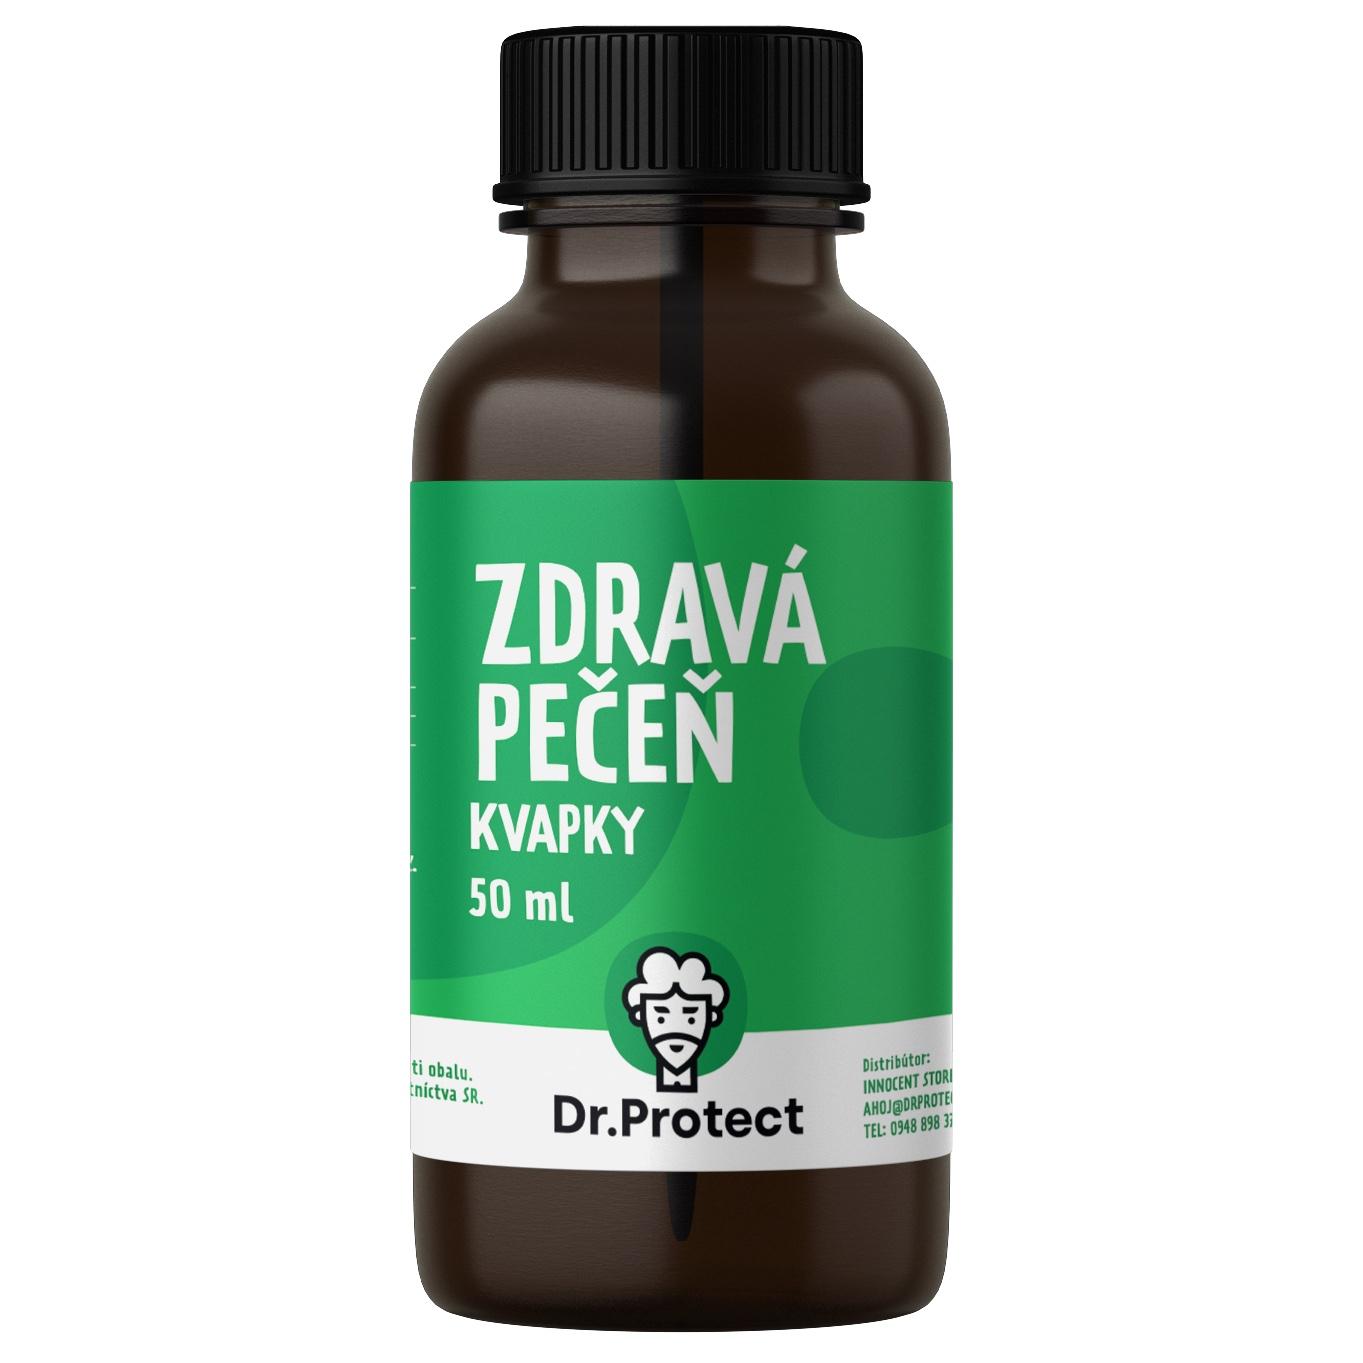 Dr.Protect Pestrec Mariánsky a Žihľava kvapky 50 ml